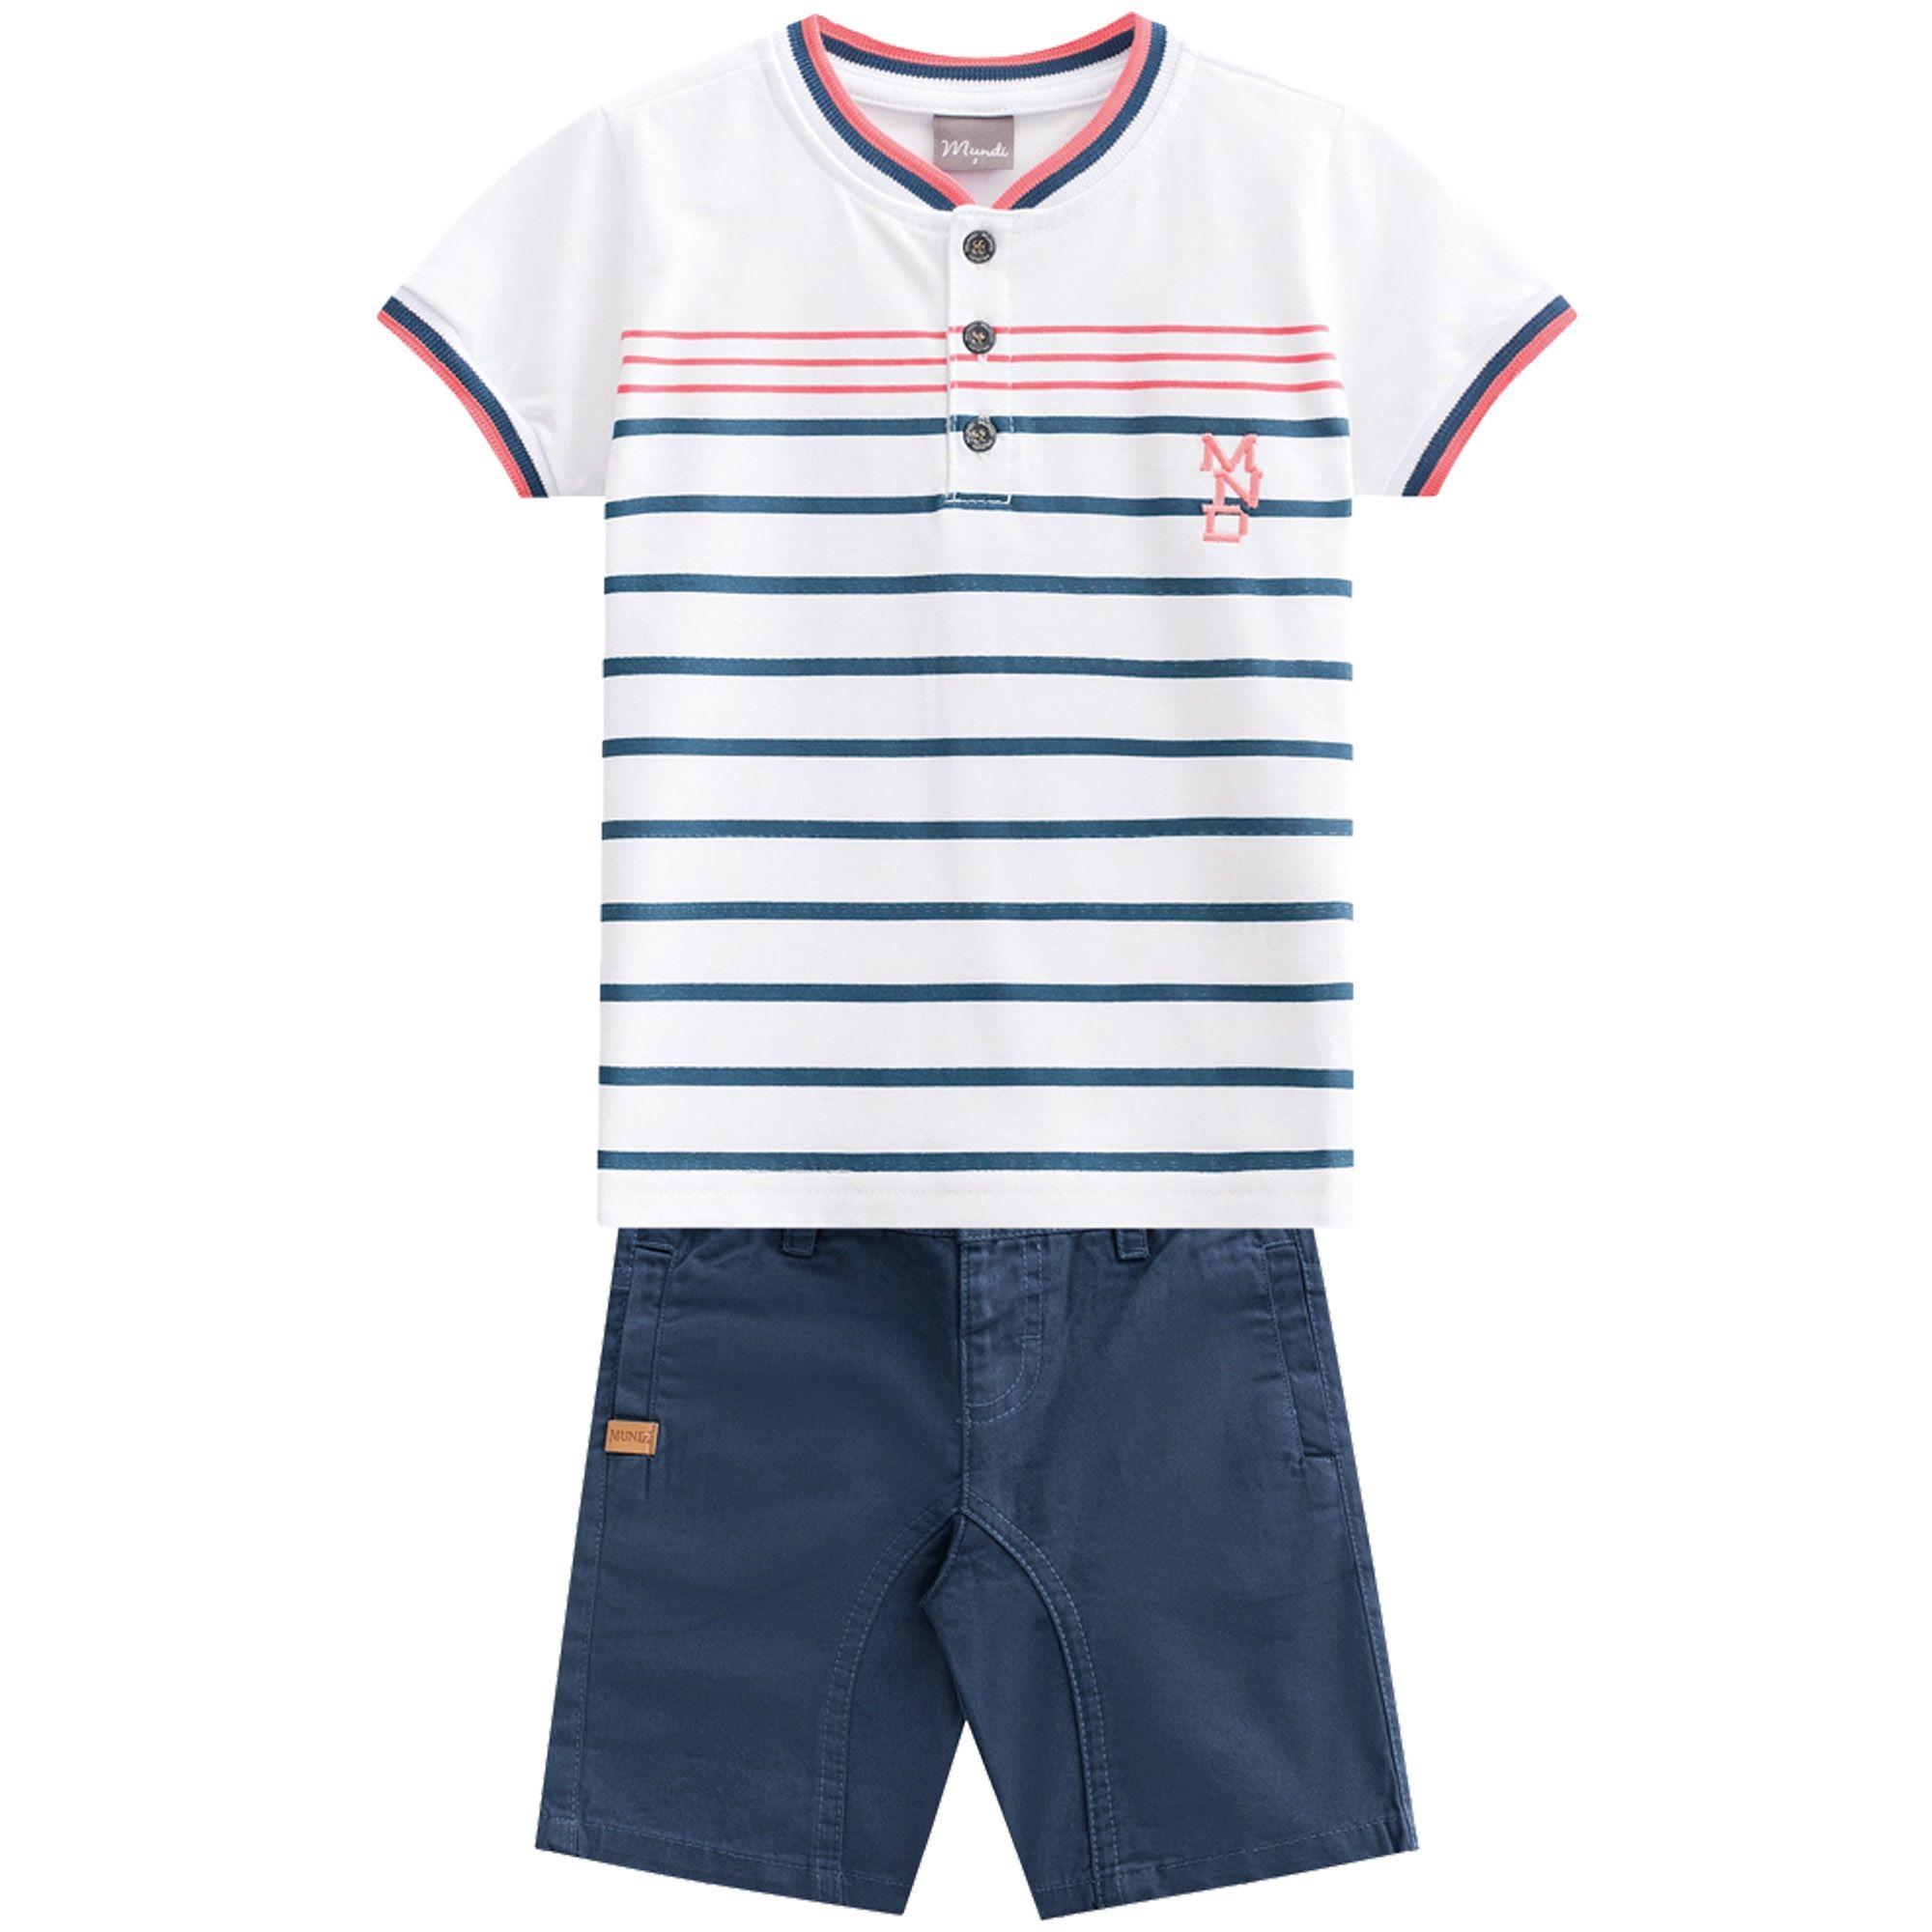 Conjunto Verão Brandili Mundi Camiseta MND Listras com Bermuda Sarja - 1 ao 3